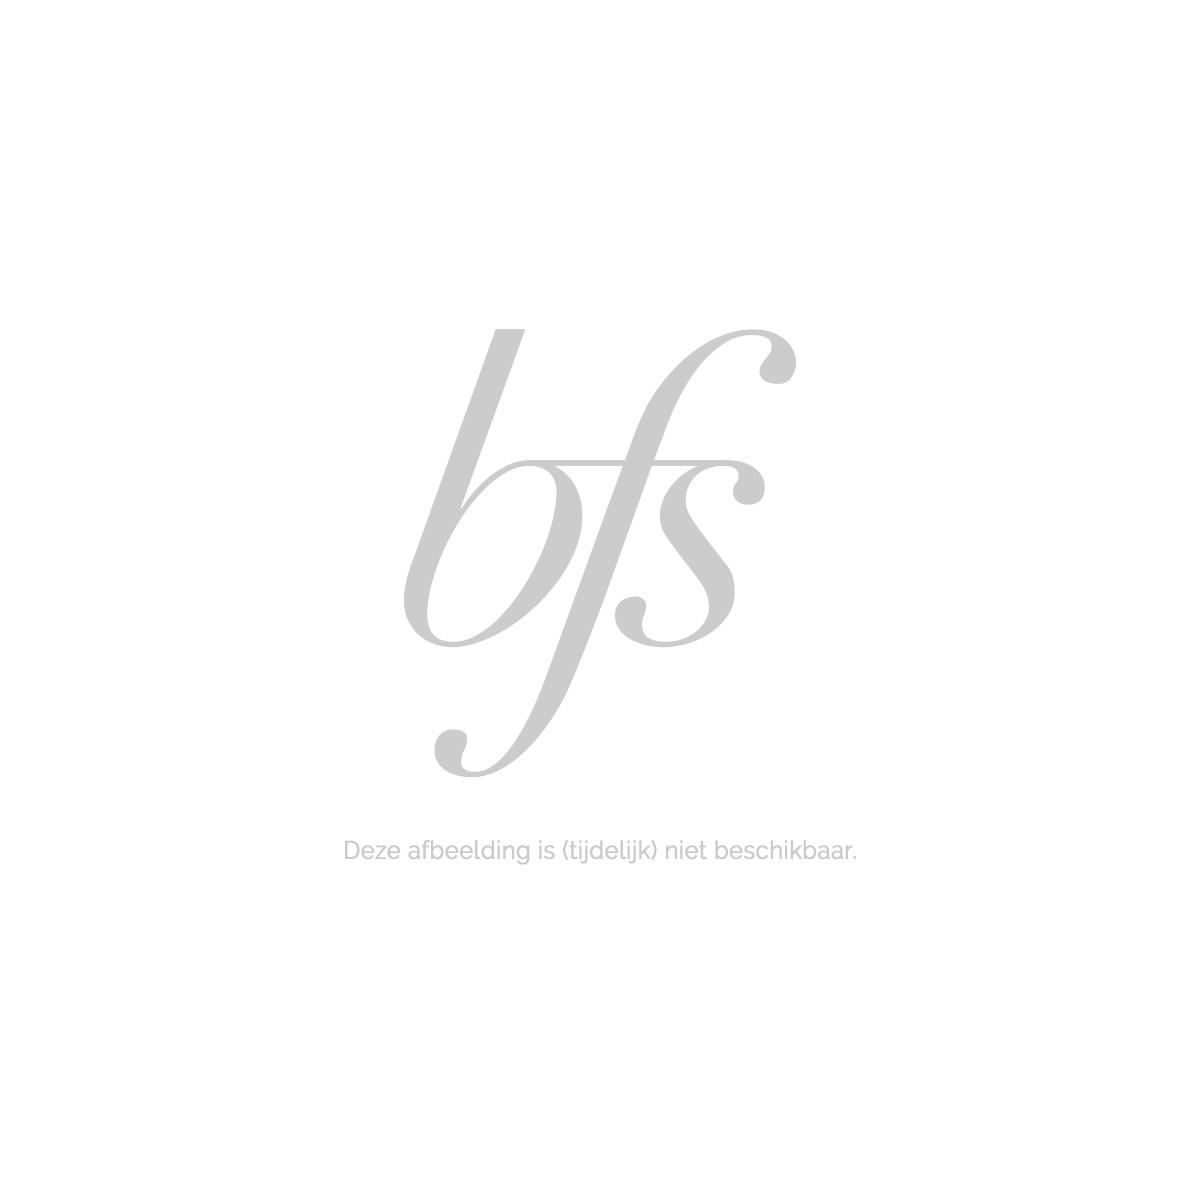 Gloria Vanderbilt Perfumed Body Lotion 150 ml